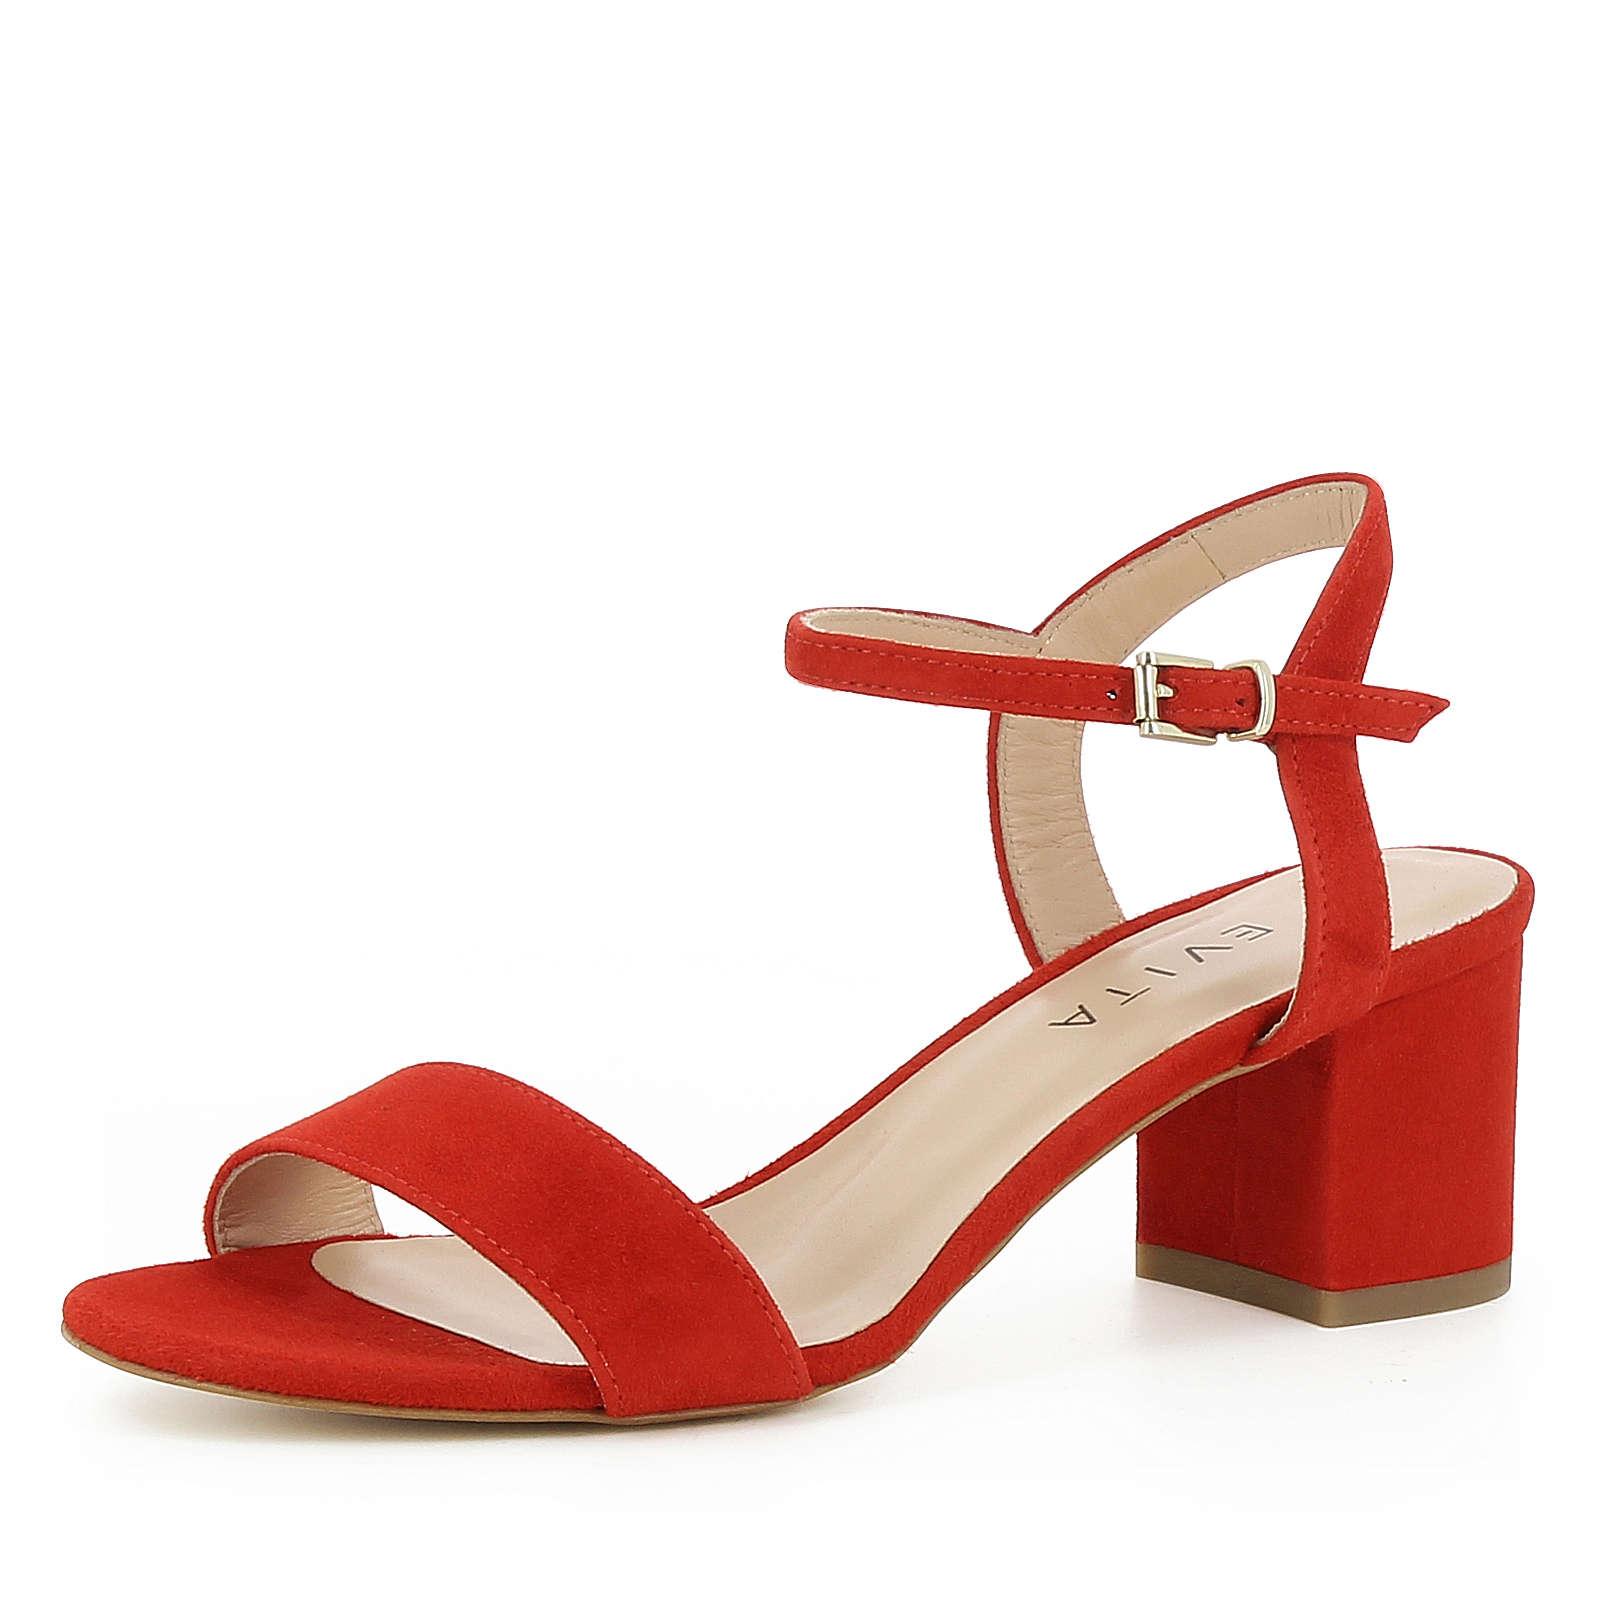 Evita Shoes Damen Sandalette MARIELLA Klassische Sandaletten rot Damen Gr. 41